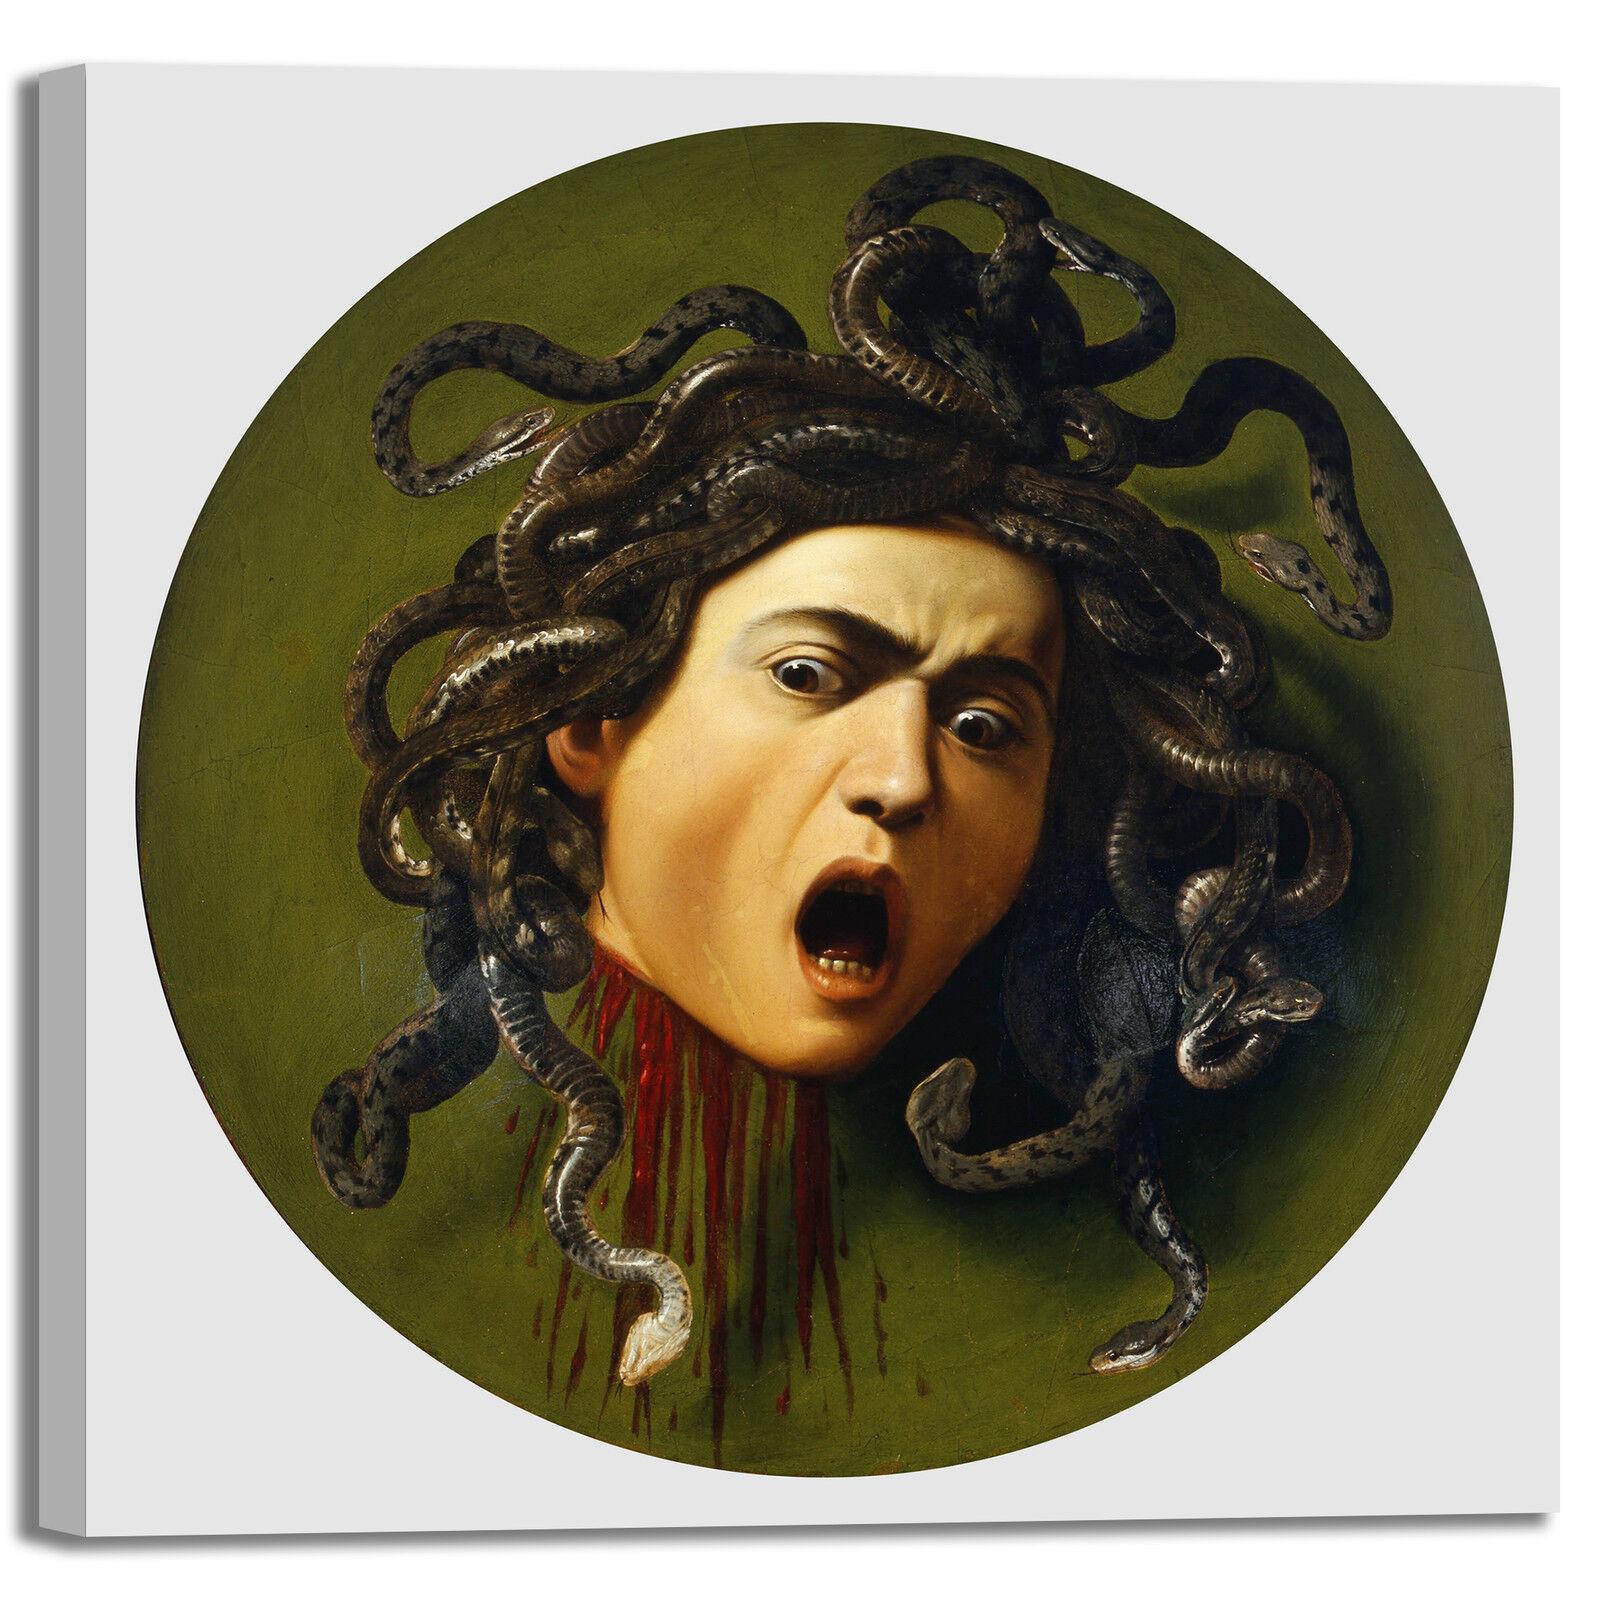 Caravaggio medusa design quadro stampa tela dipinto telaio arroto casa